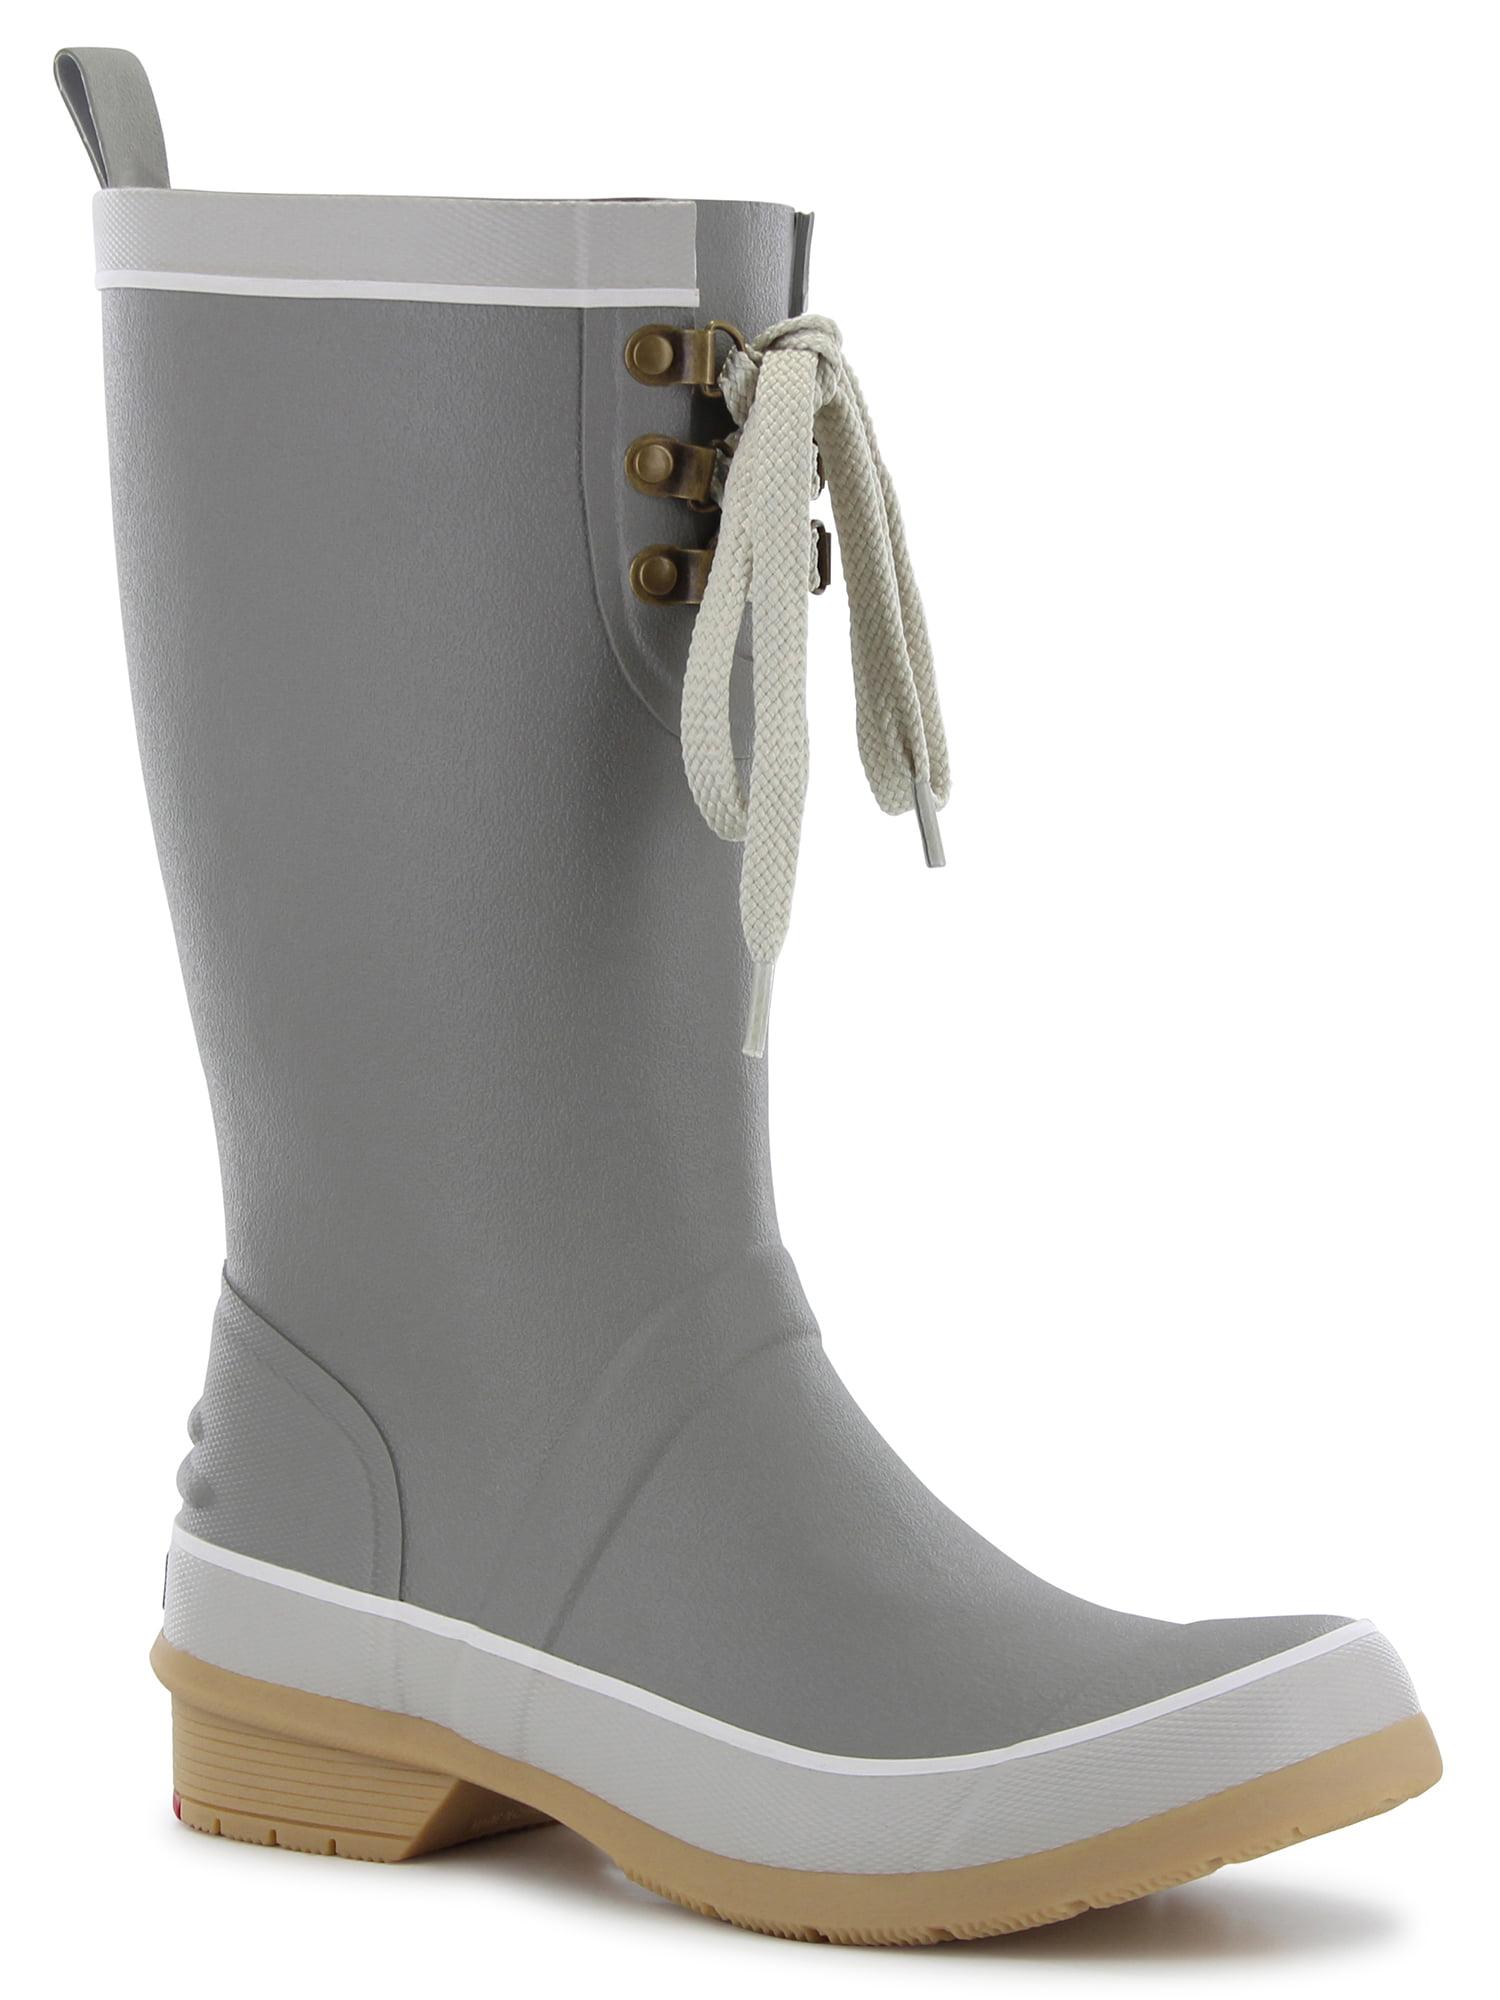 Chooka Women's Whidbey Rain Boot Economical, stylish, and eye-catching shoes